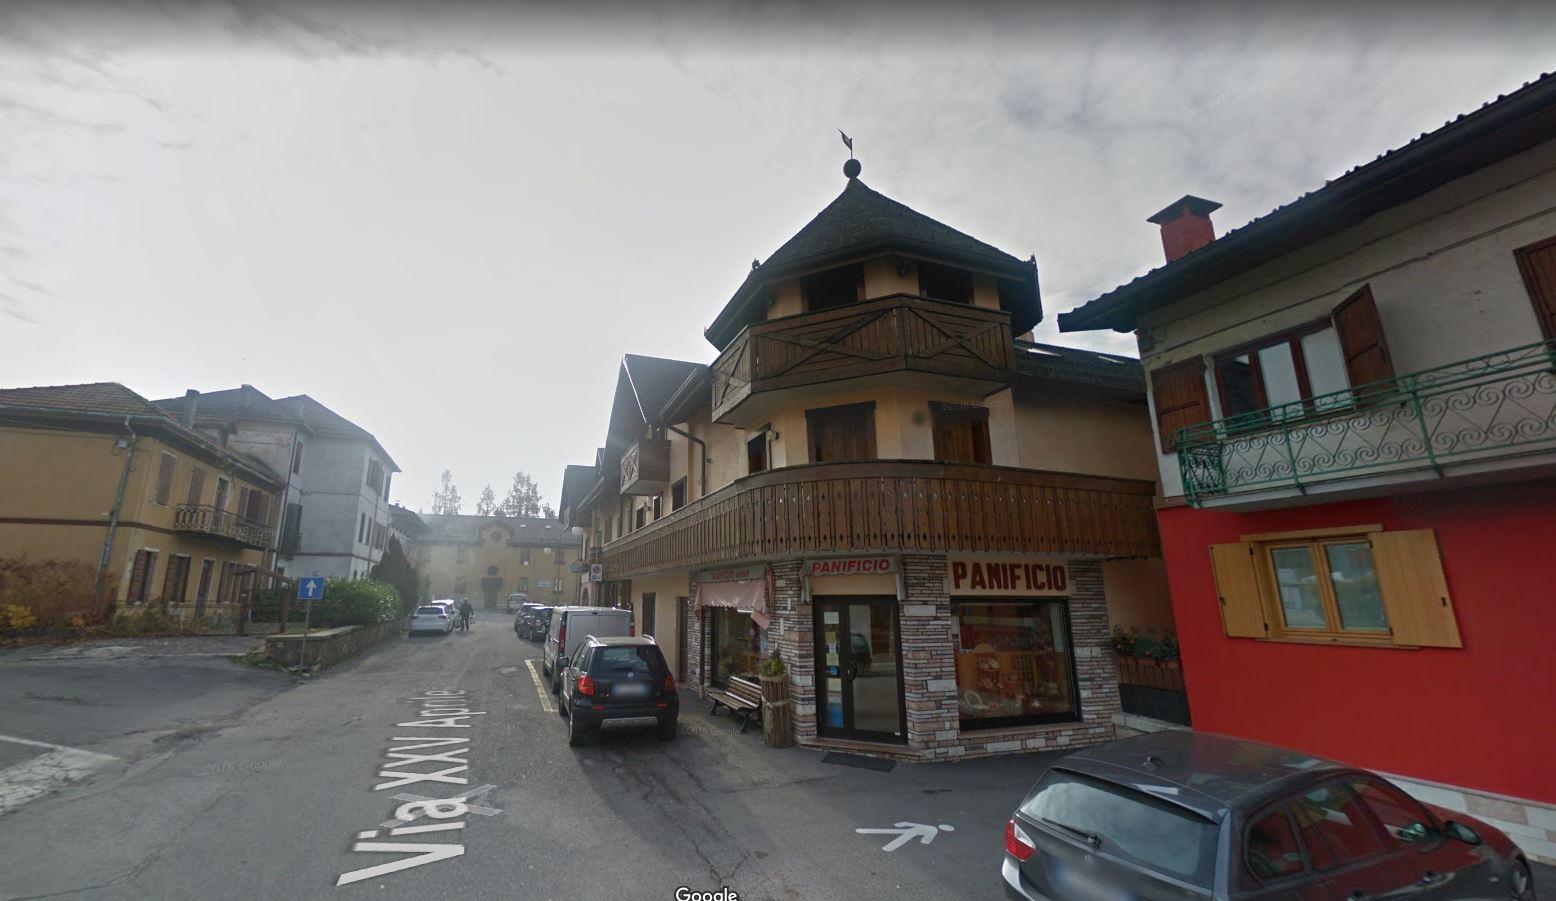 Case in vendita provincia vicenza cerco casa in vendita for Cerco casa vicenza